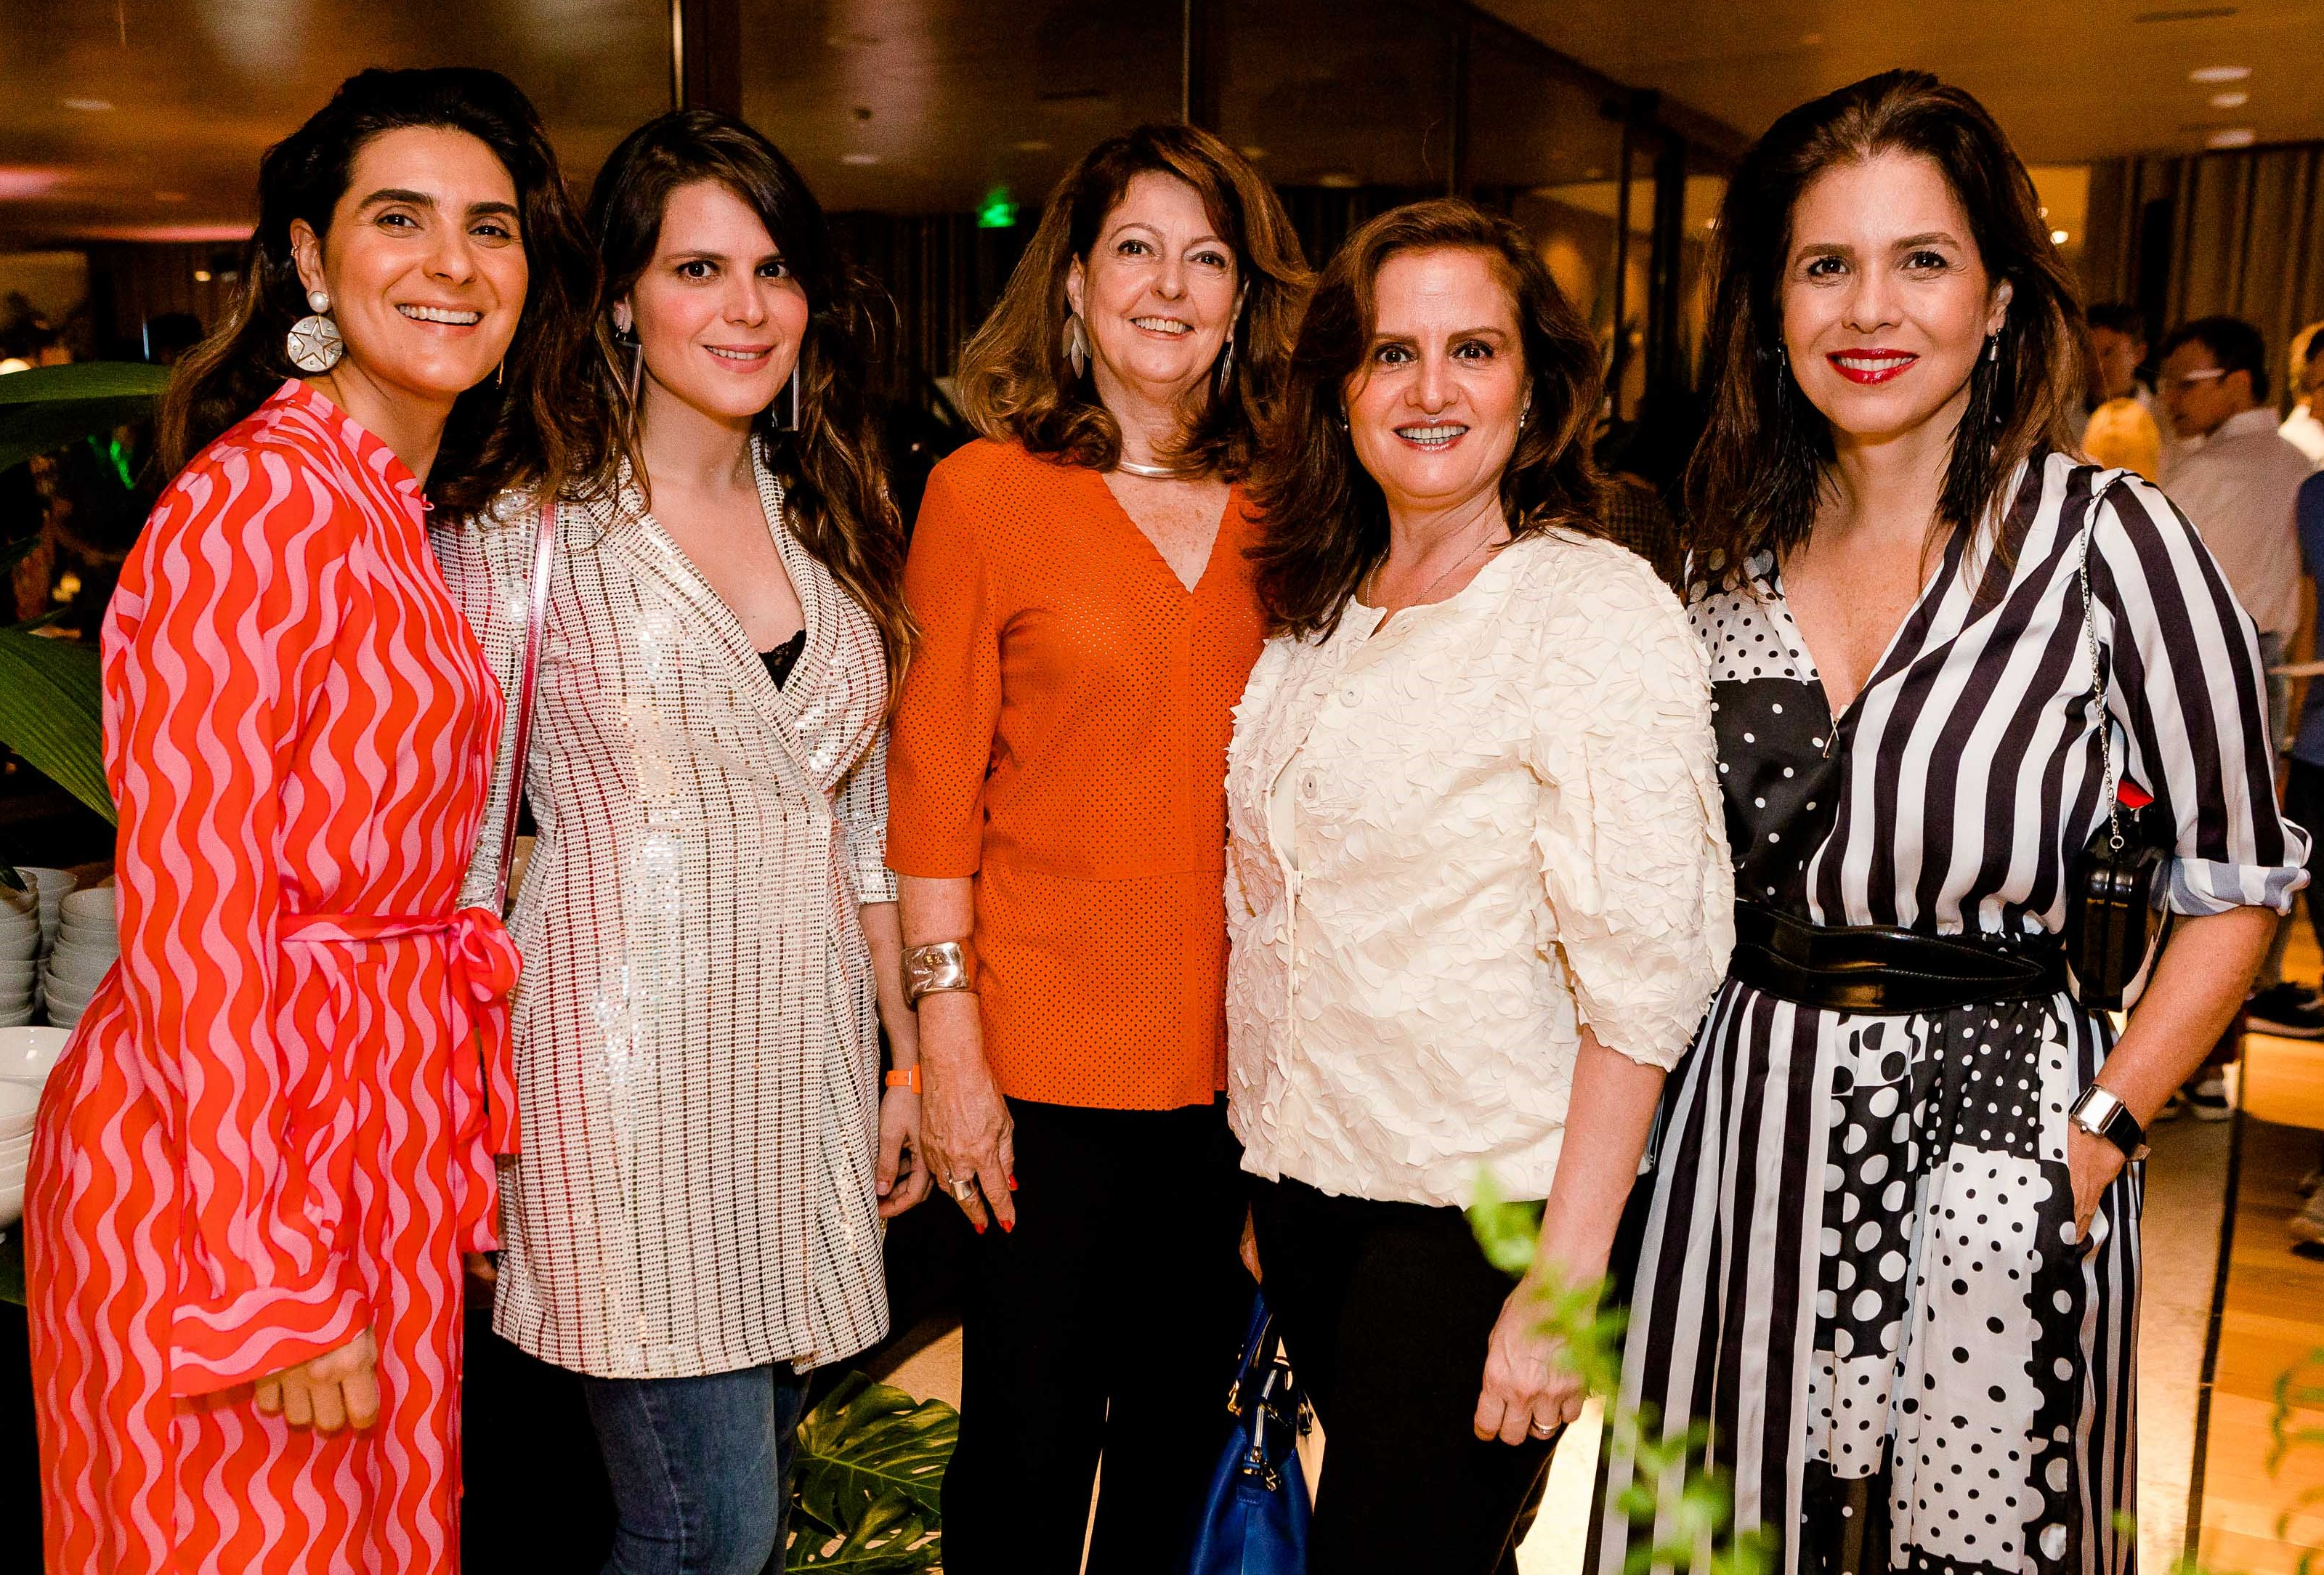 Roberta do Rio, Paloma Danemberg, Mariangela Danemberg, Katia Danemberg e Angela Hall /Foto: Bruno Ryfer